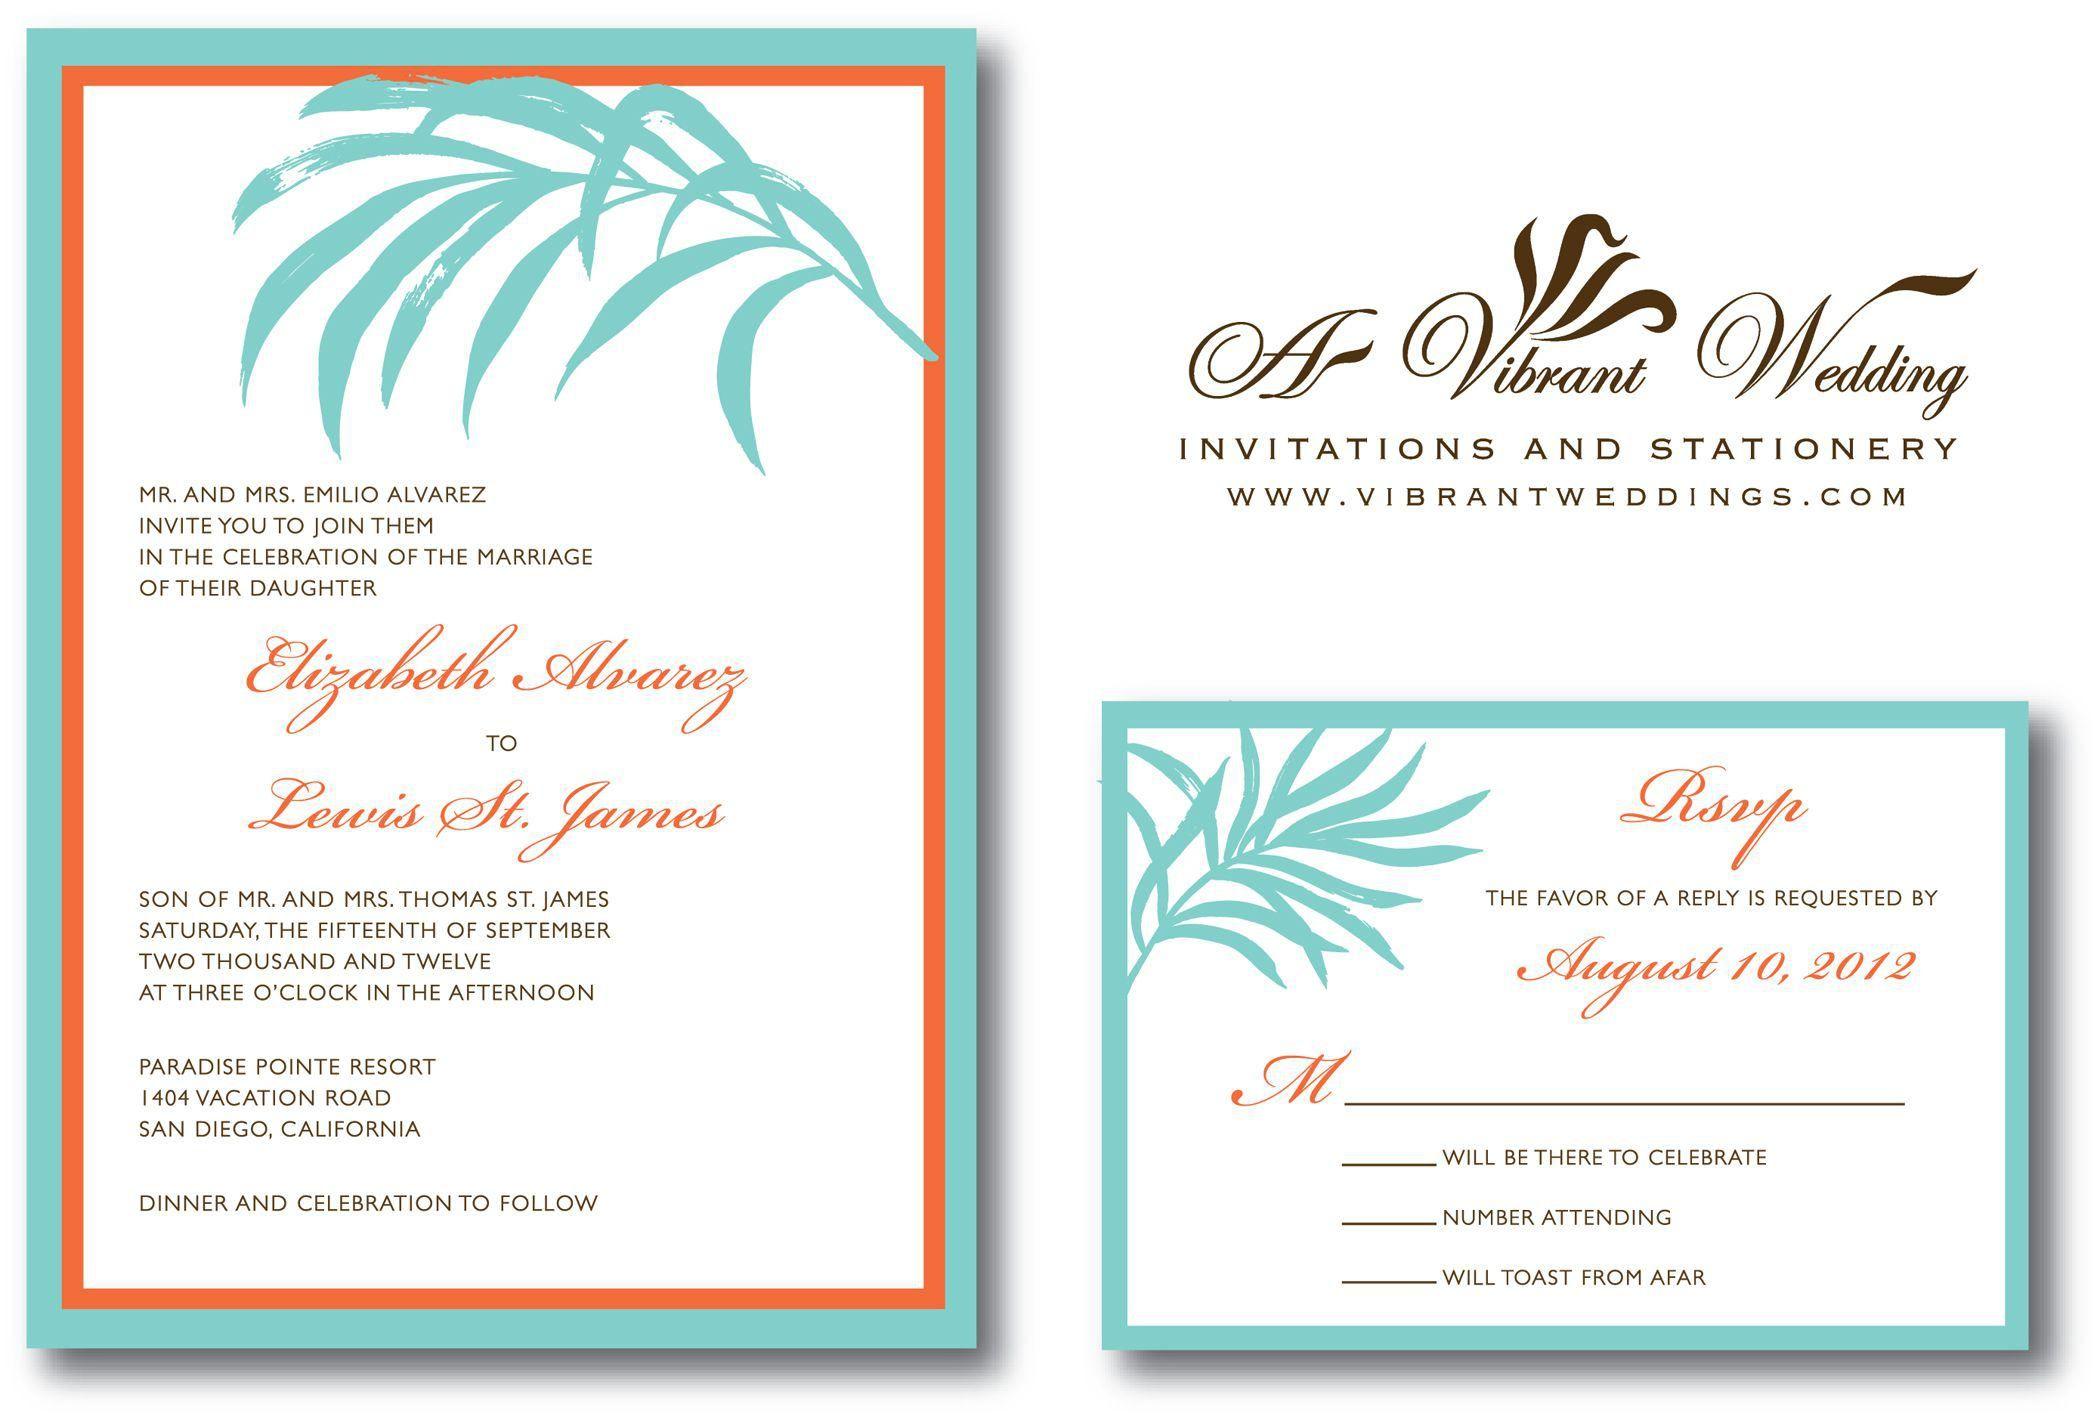 beach wedding invitation sample (With images) Wedding